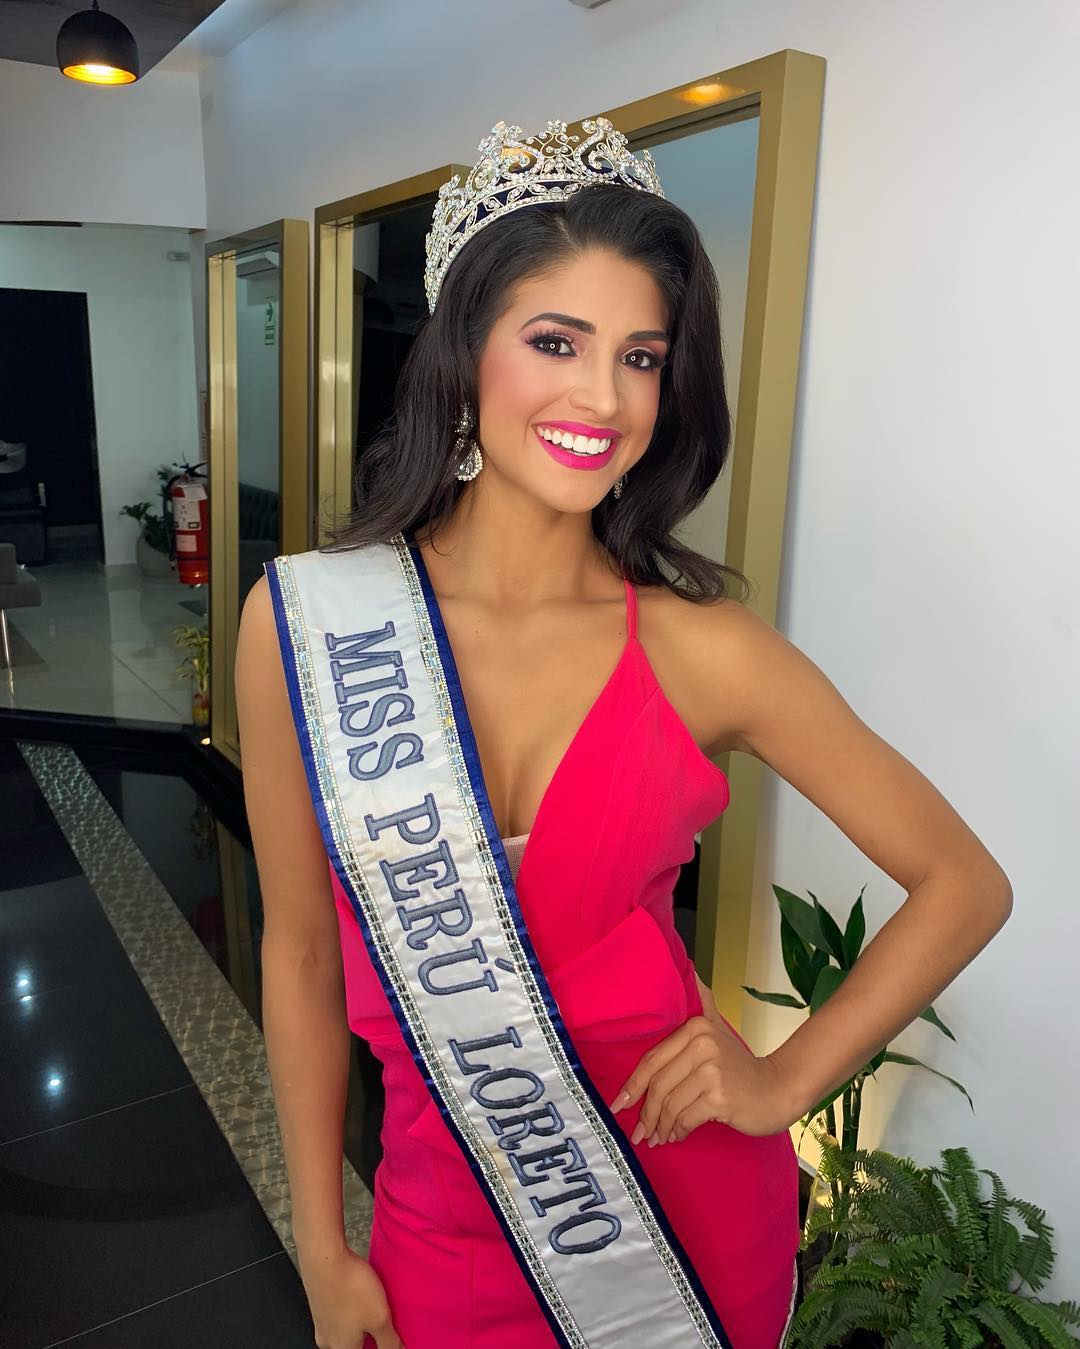 lucia arellano, top 6 de miss peru 2019.  - Página 2 43546610